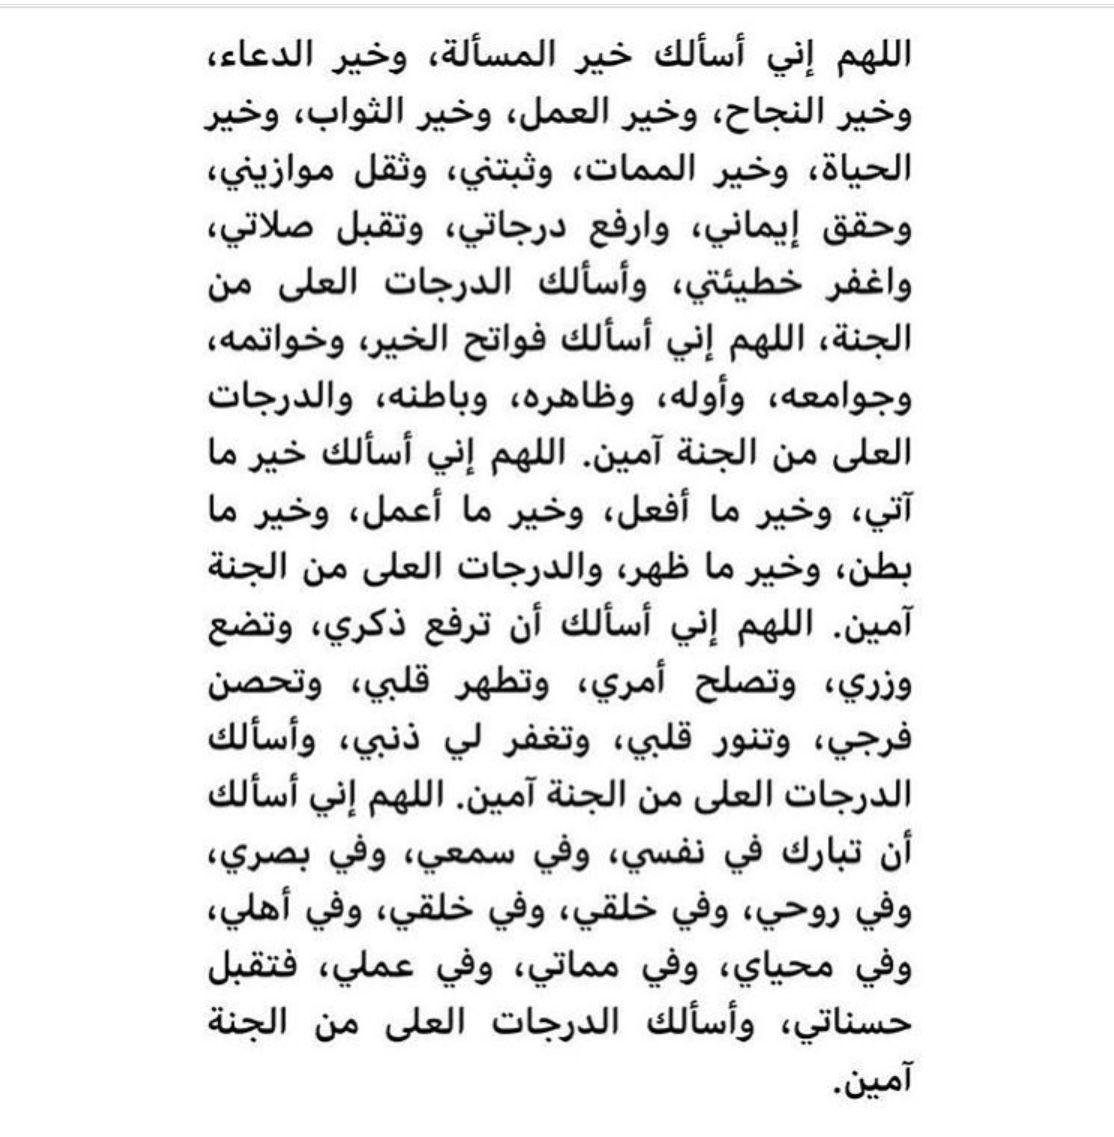 Pin By Doaa On Dou3a Duaa Islam Islam Words